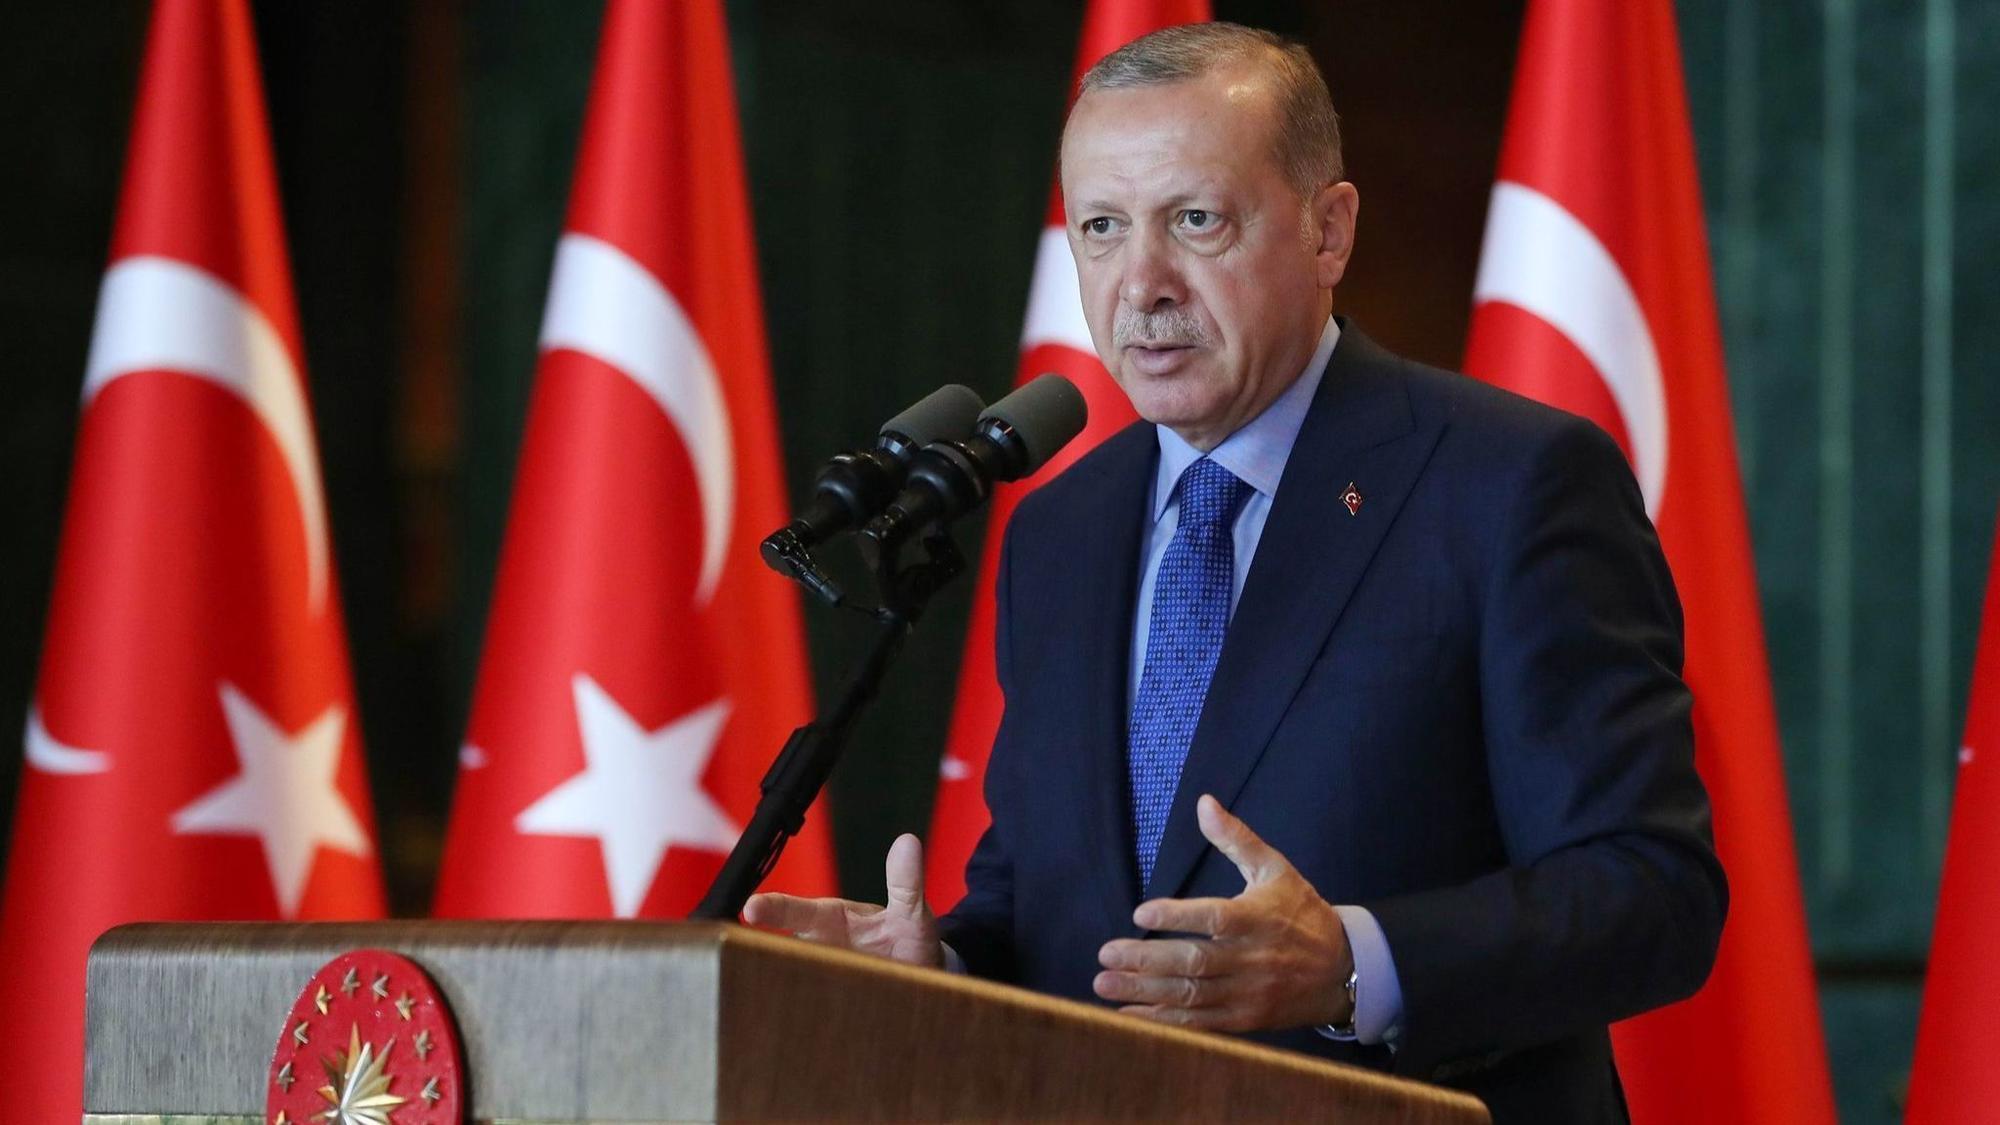 Erdogan - Fuente foto Google - Data Urgente